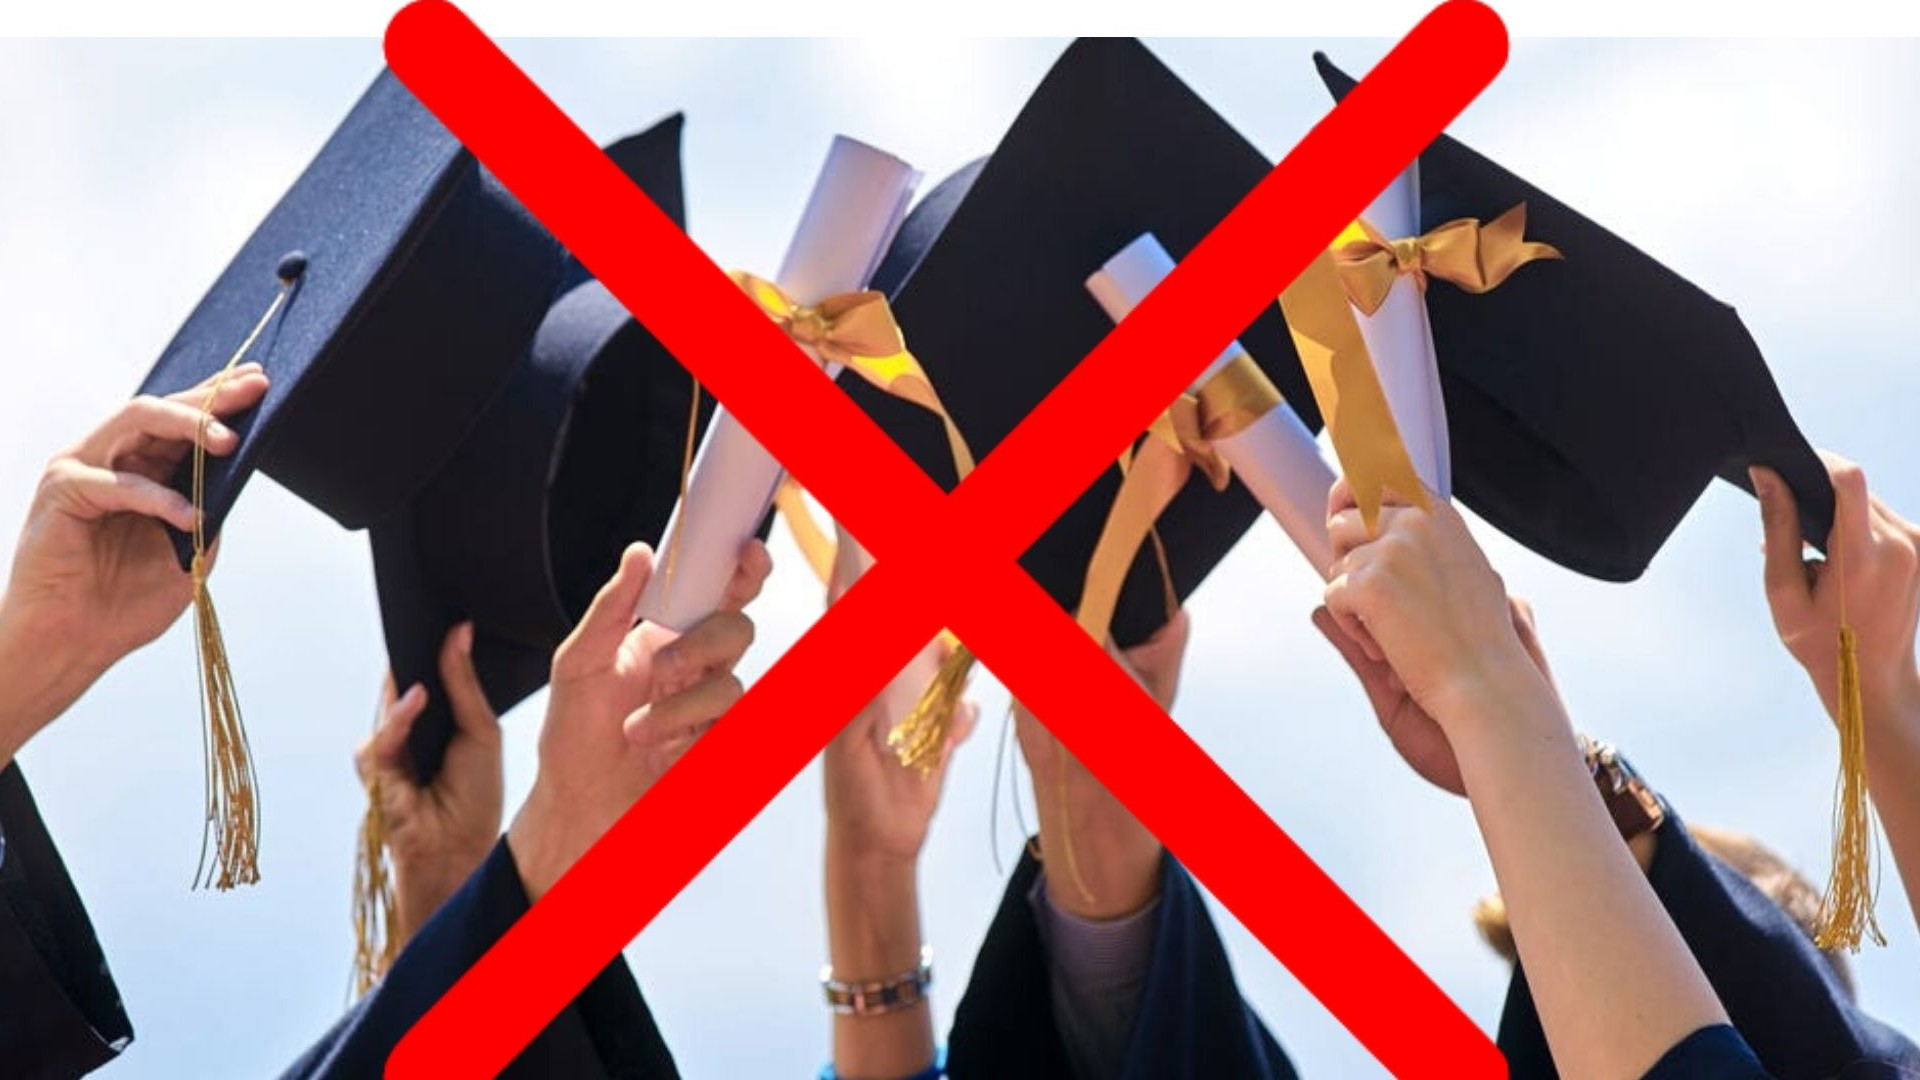 successful high school dropouts